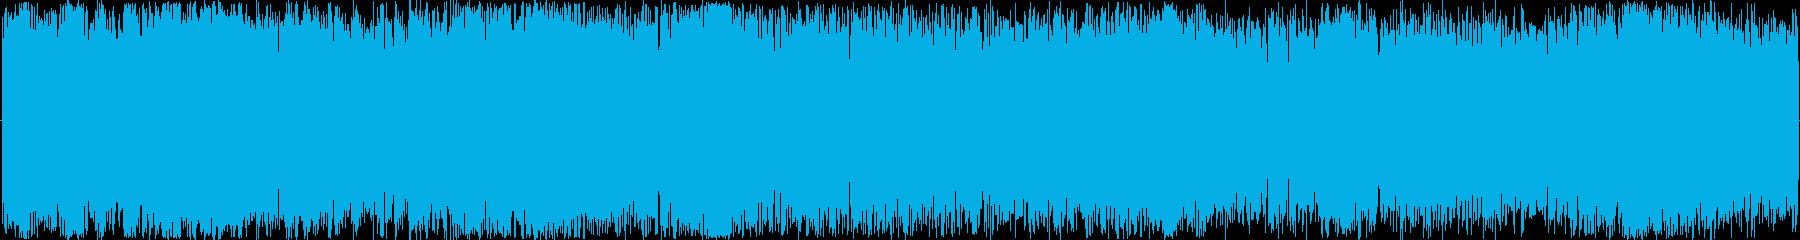 ATMO ABSTRACT Scr...の再生済みの波形